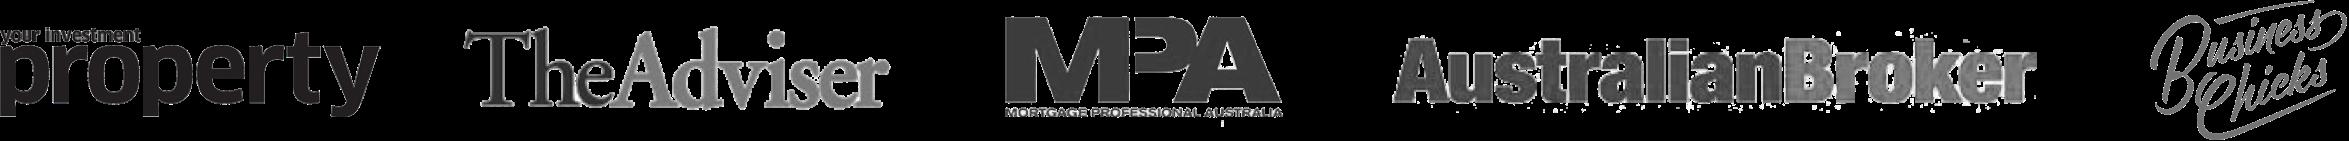 mob-client-logos.png